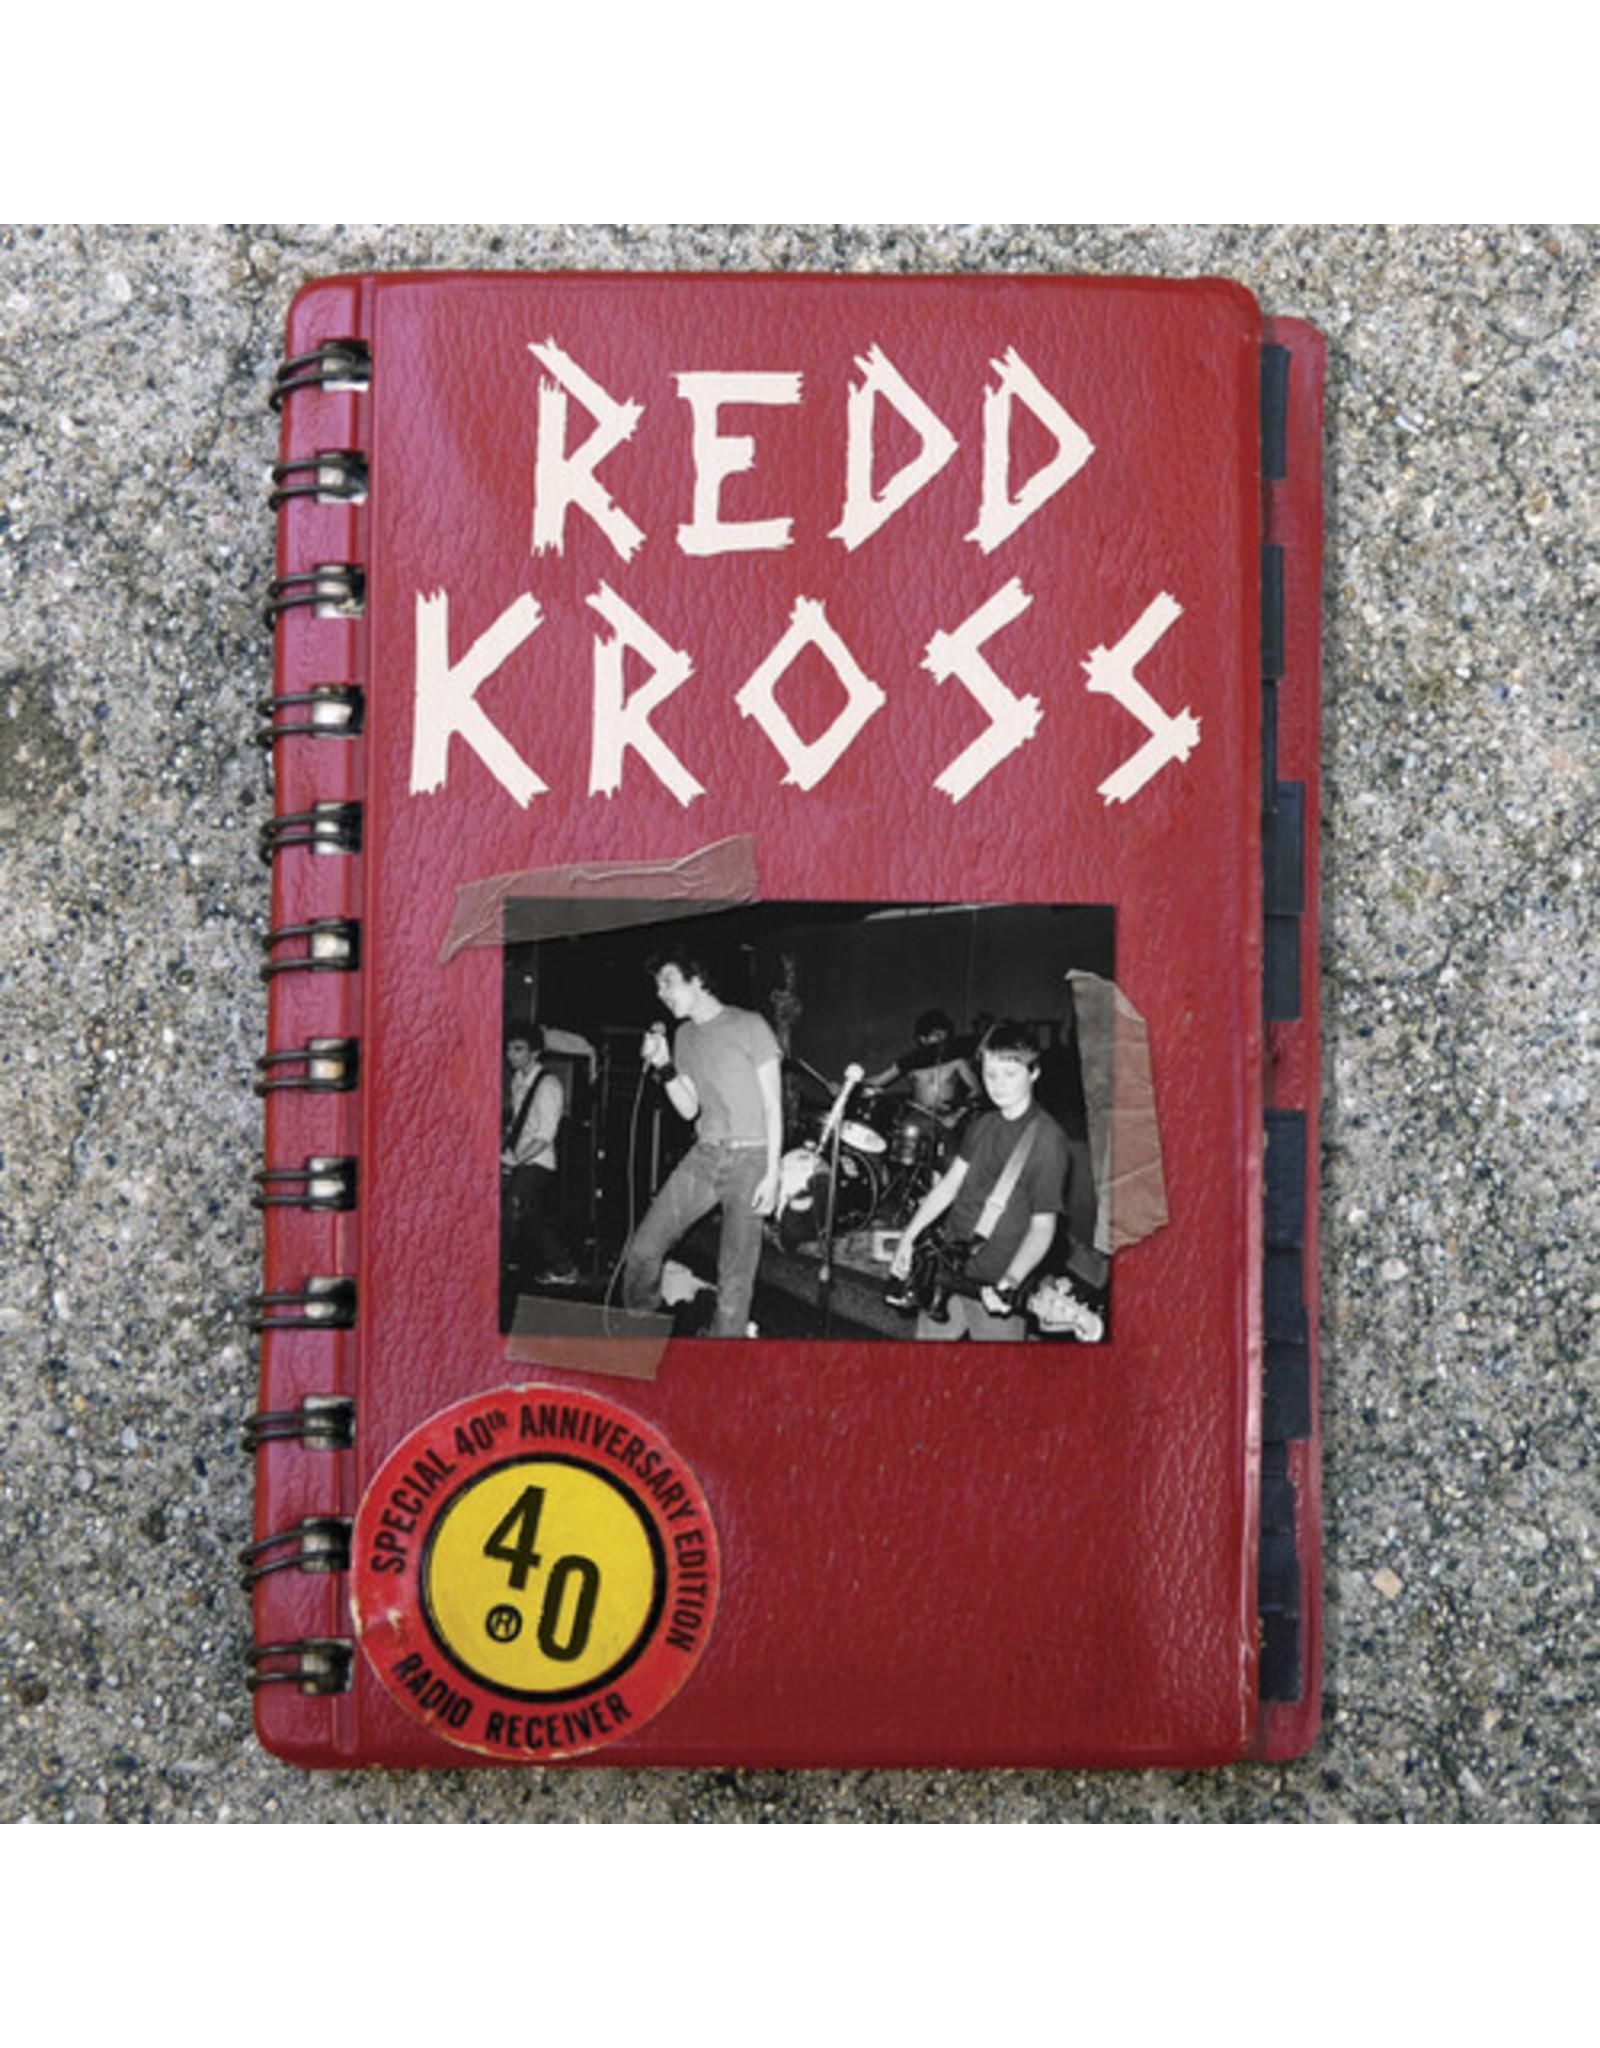 "New Vinyl Redd Kross - S/T EP (40th Anniversary) 12"""